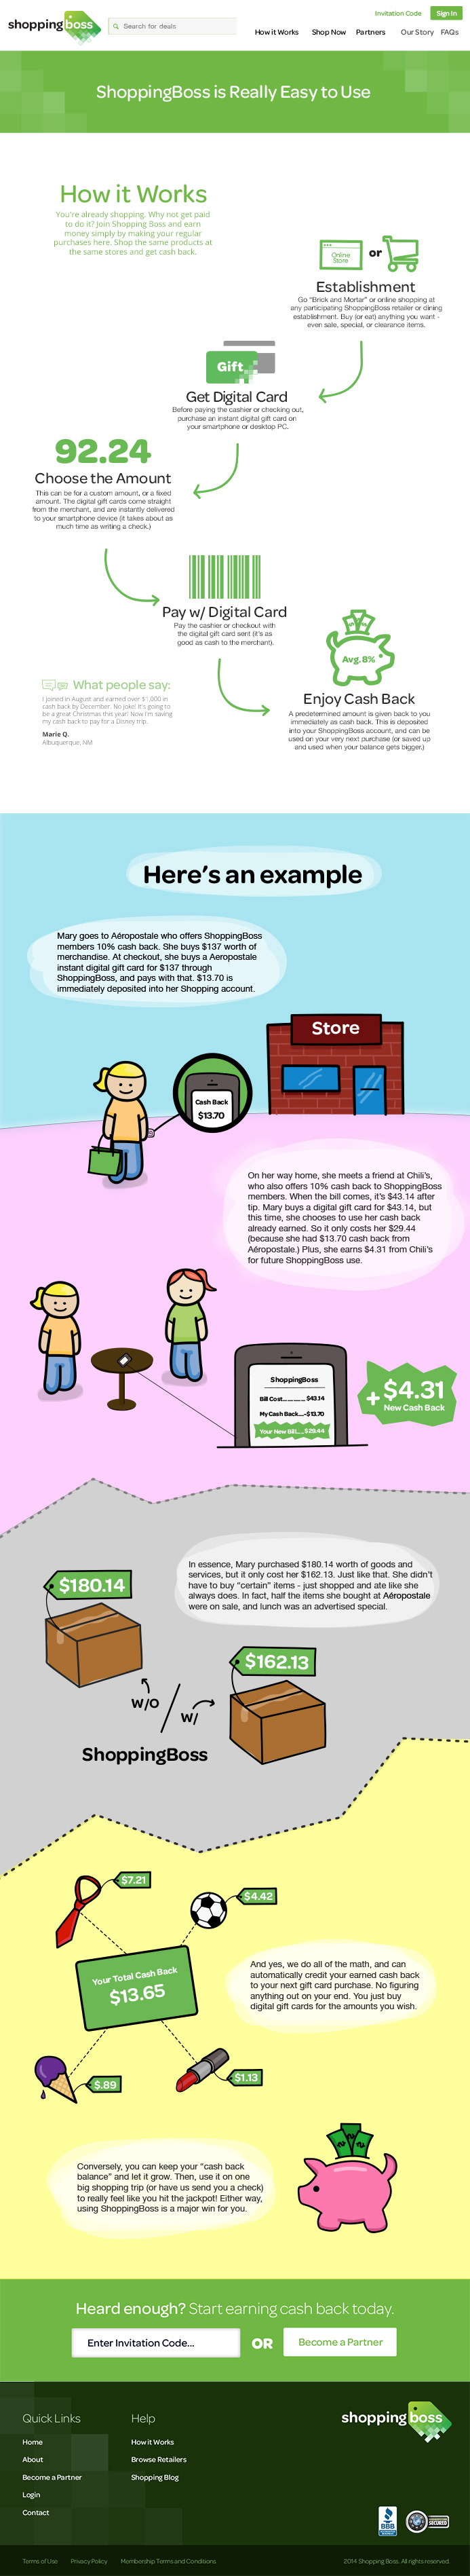 ShoppingBoss custom infograhics and icons